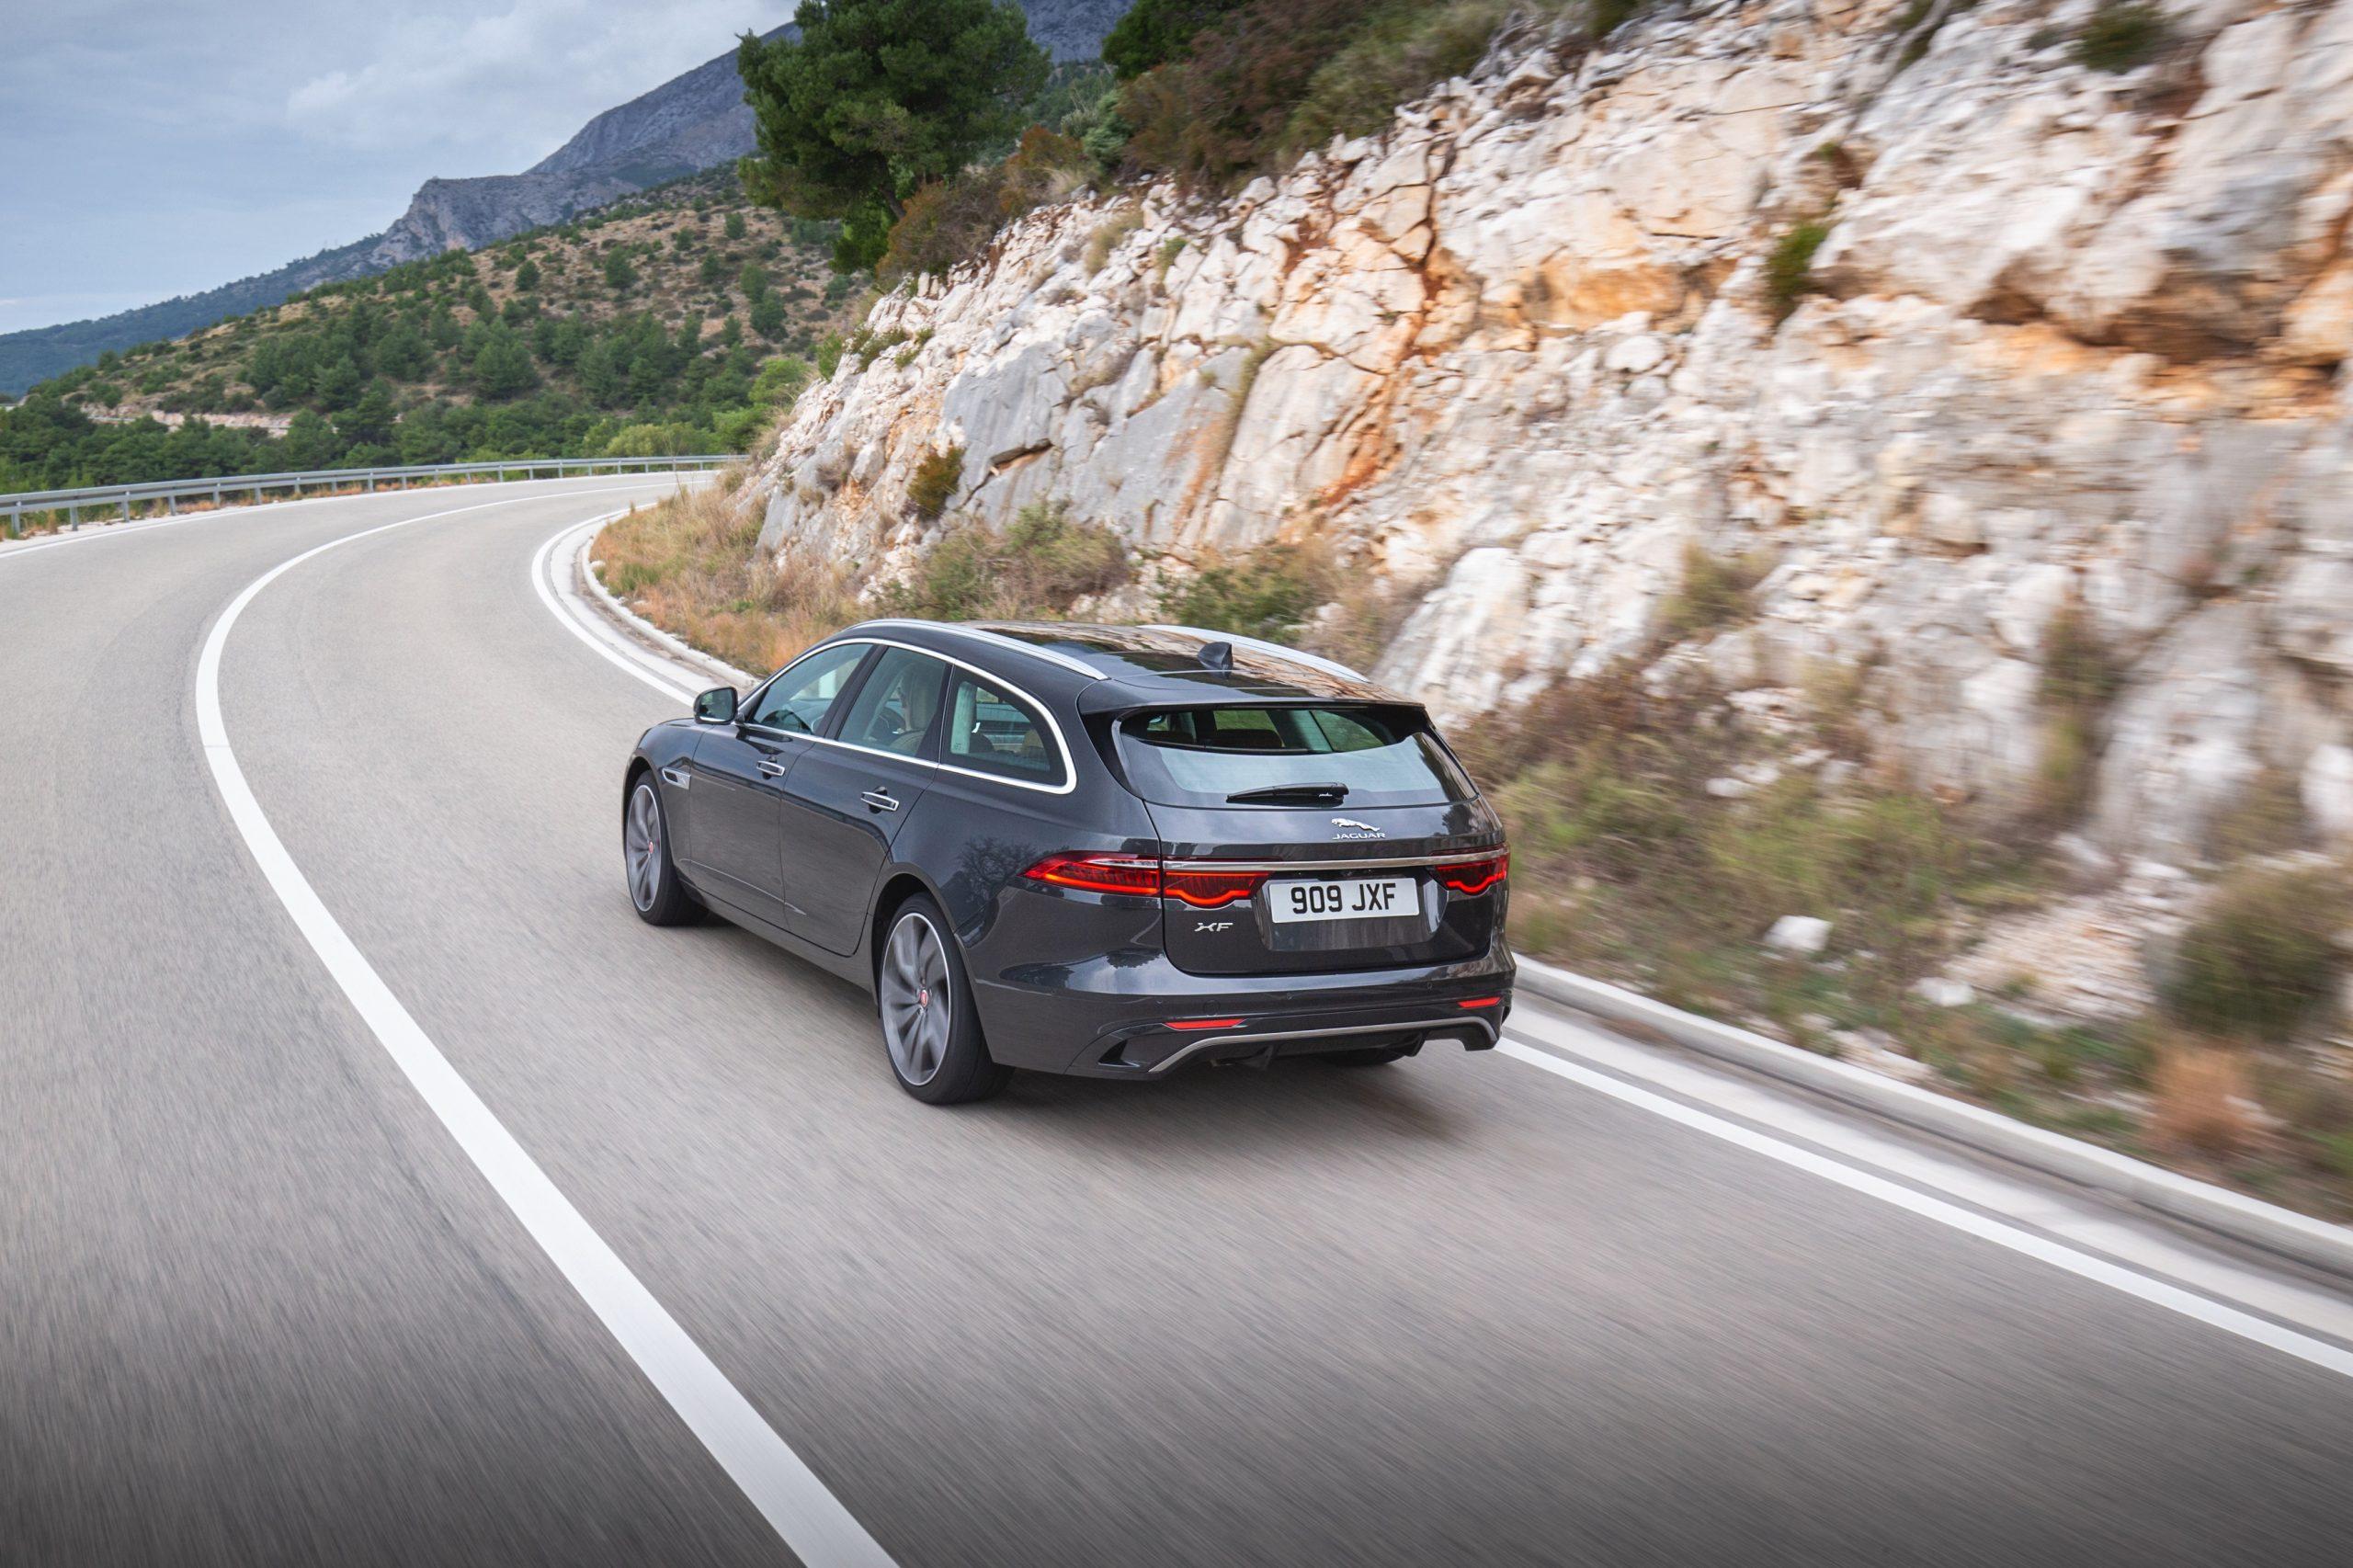 Auto Stahl der neue Jaguar XF Sportbrake